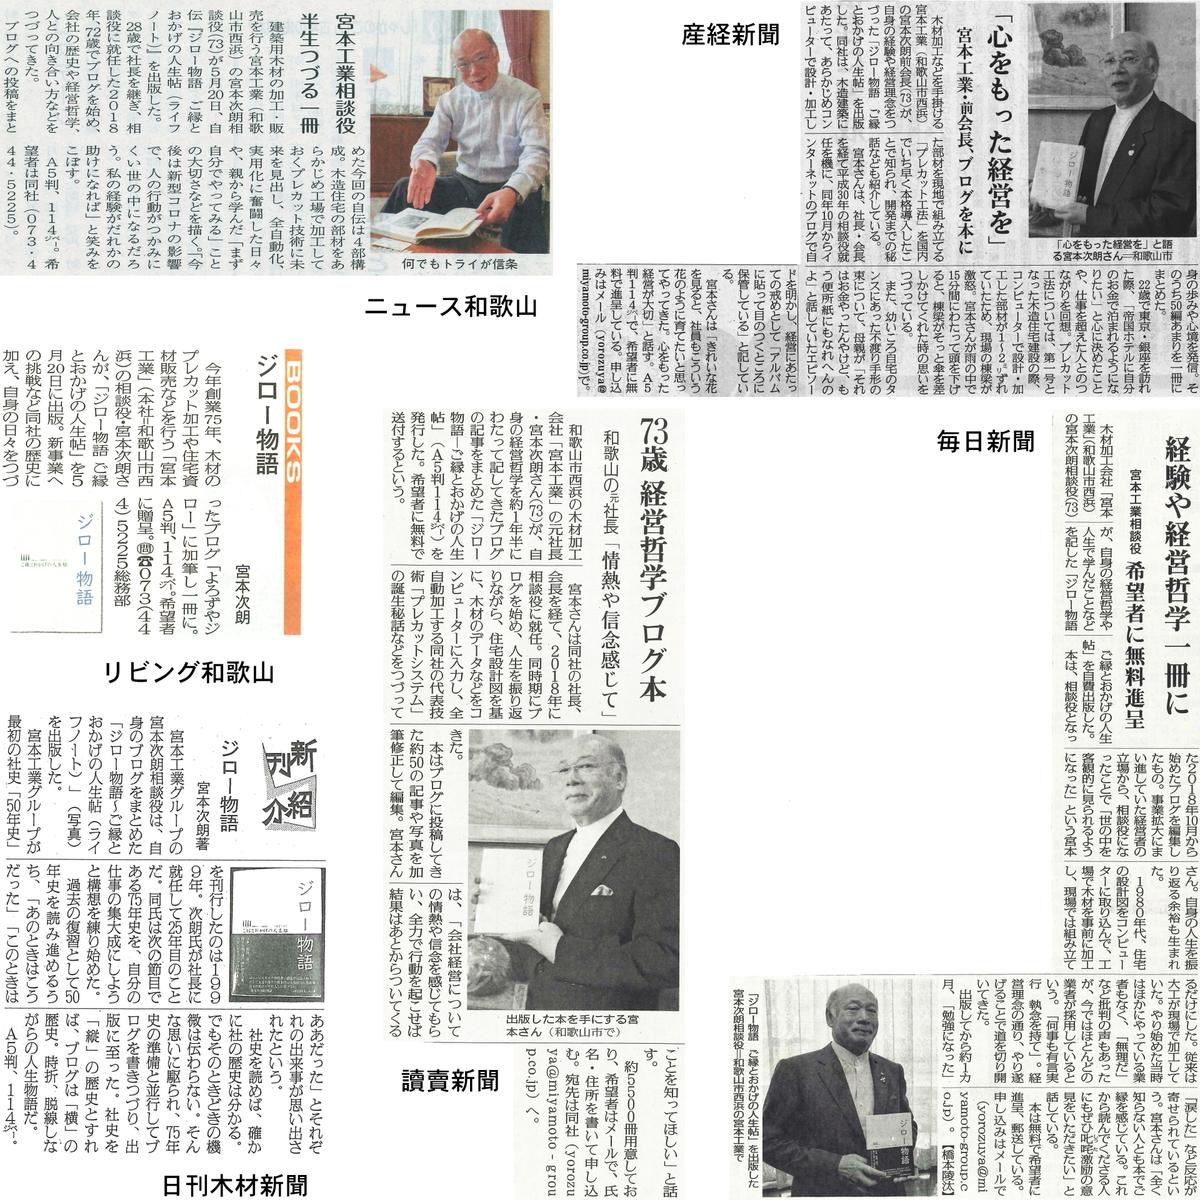 f:id:yorozuyajiro:20200707144707j:plain